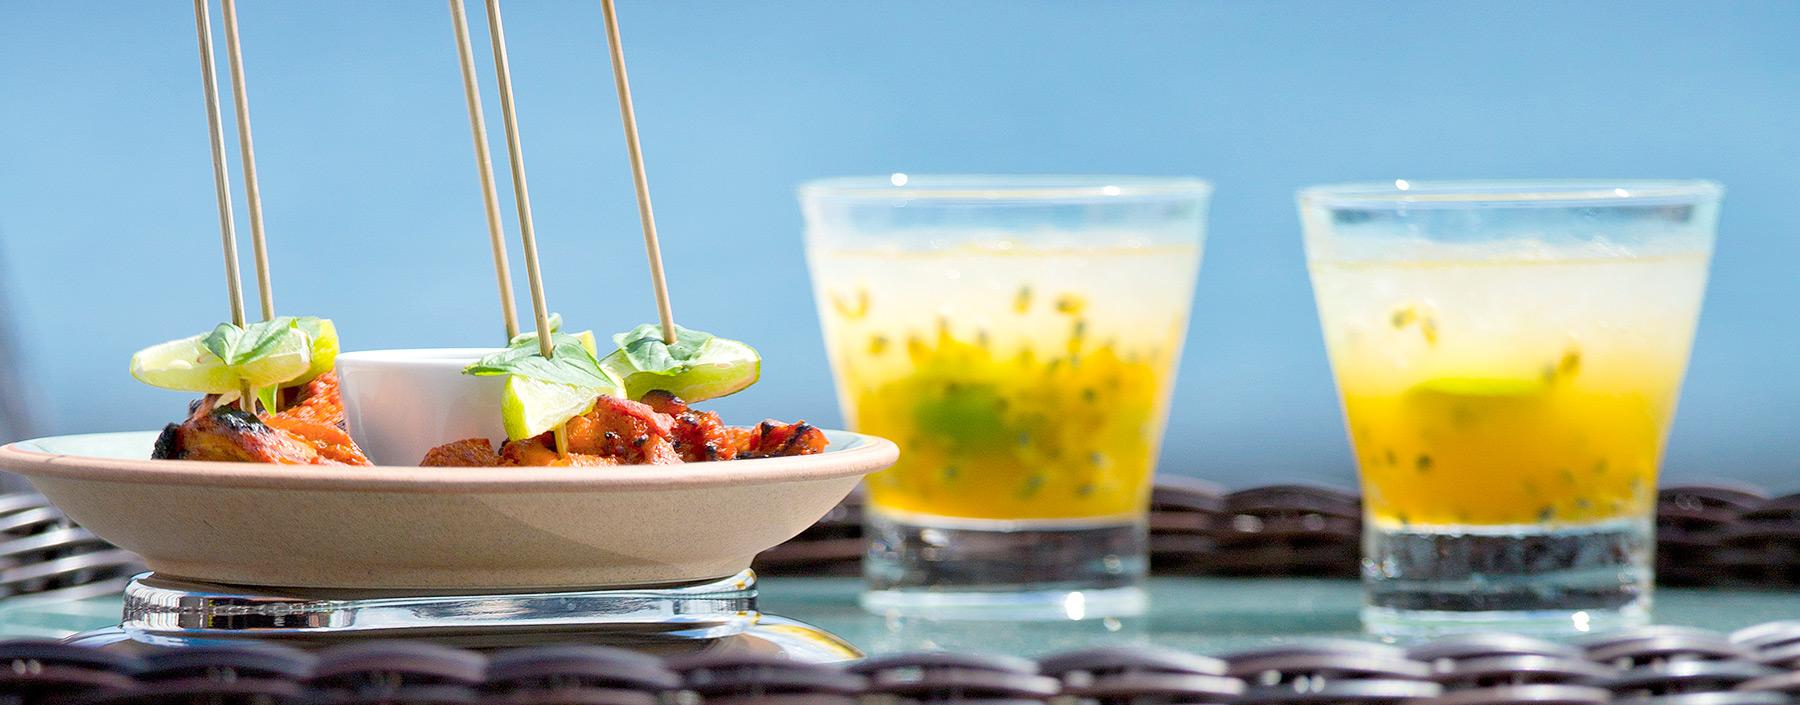 All Inclusive Meal Plans | Kurumba Maldives Resort